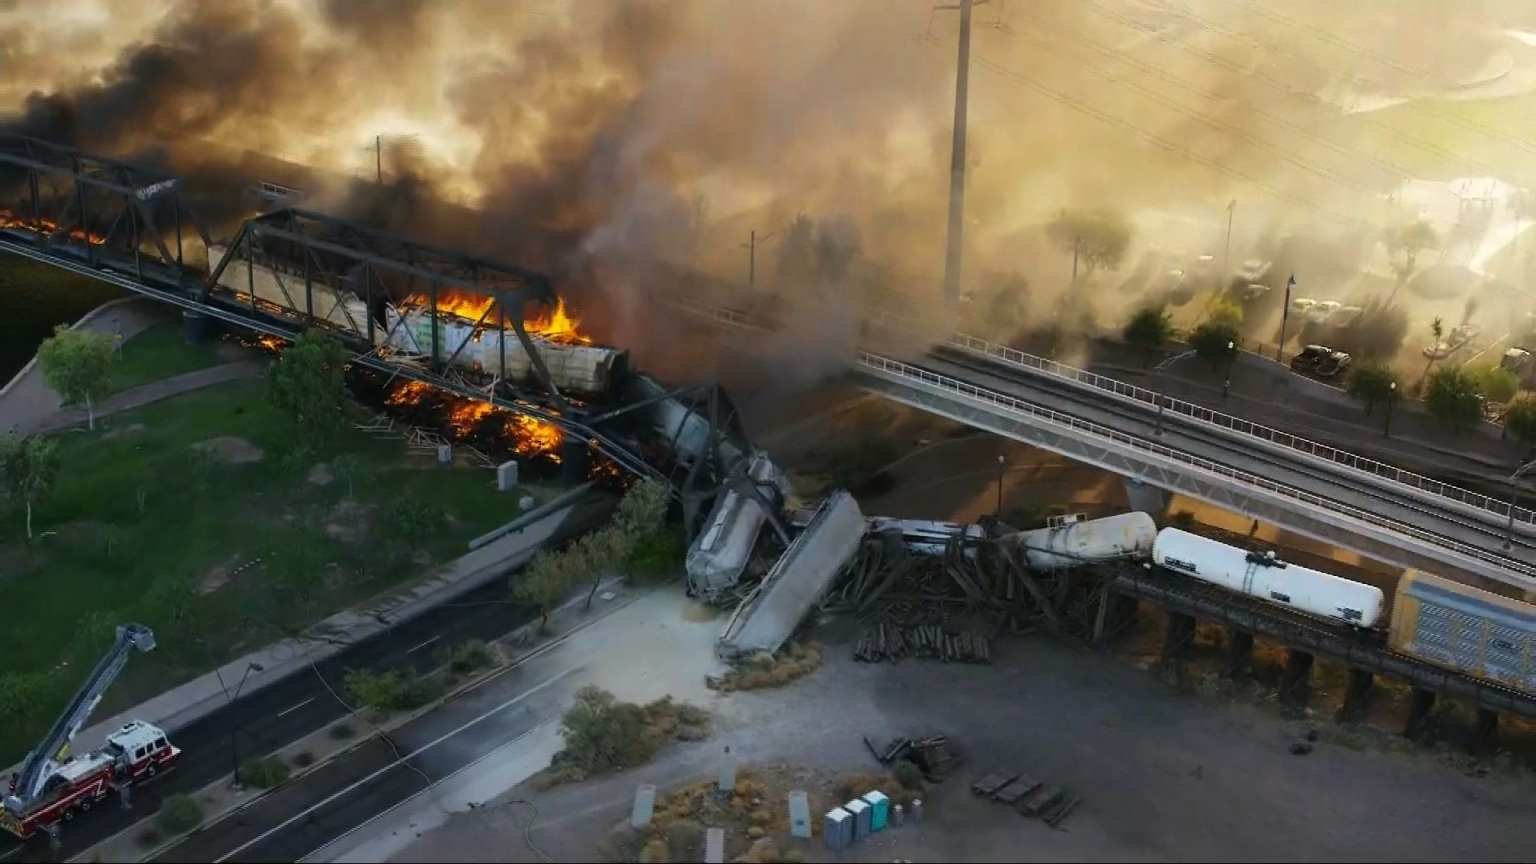 Train holding hazardous material derails, catches fire in Arizona